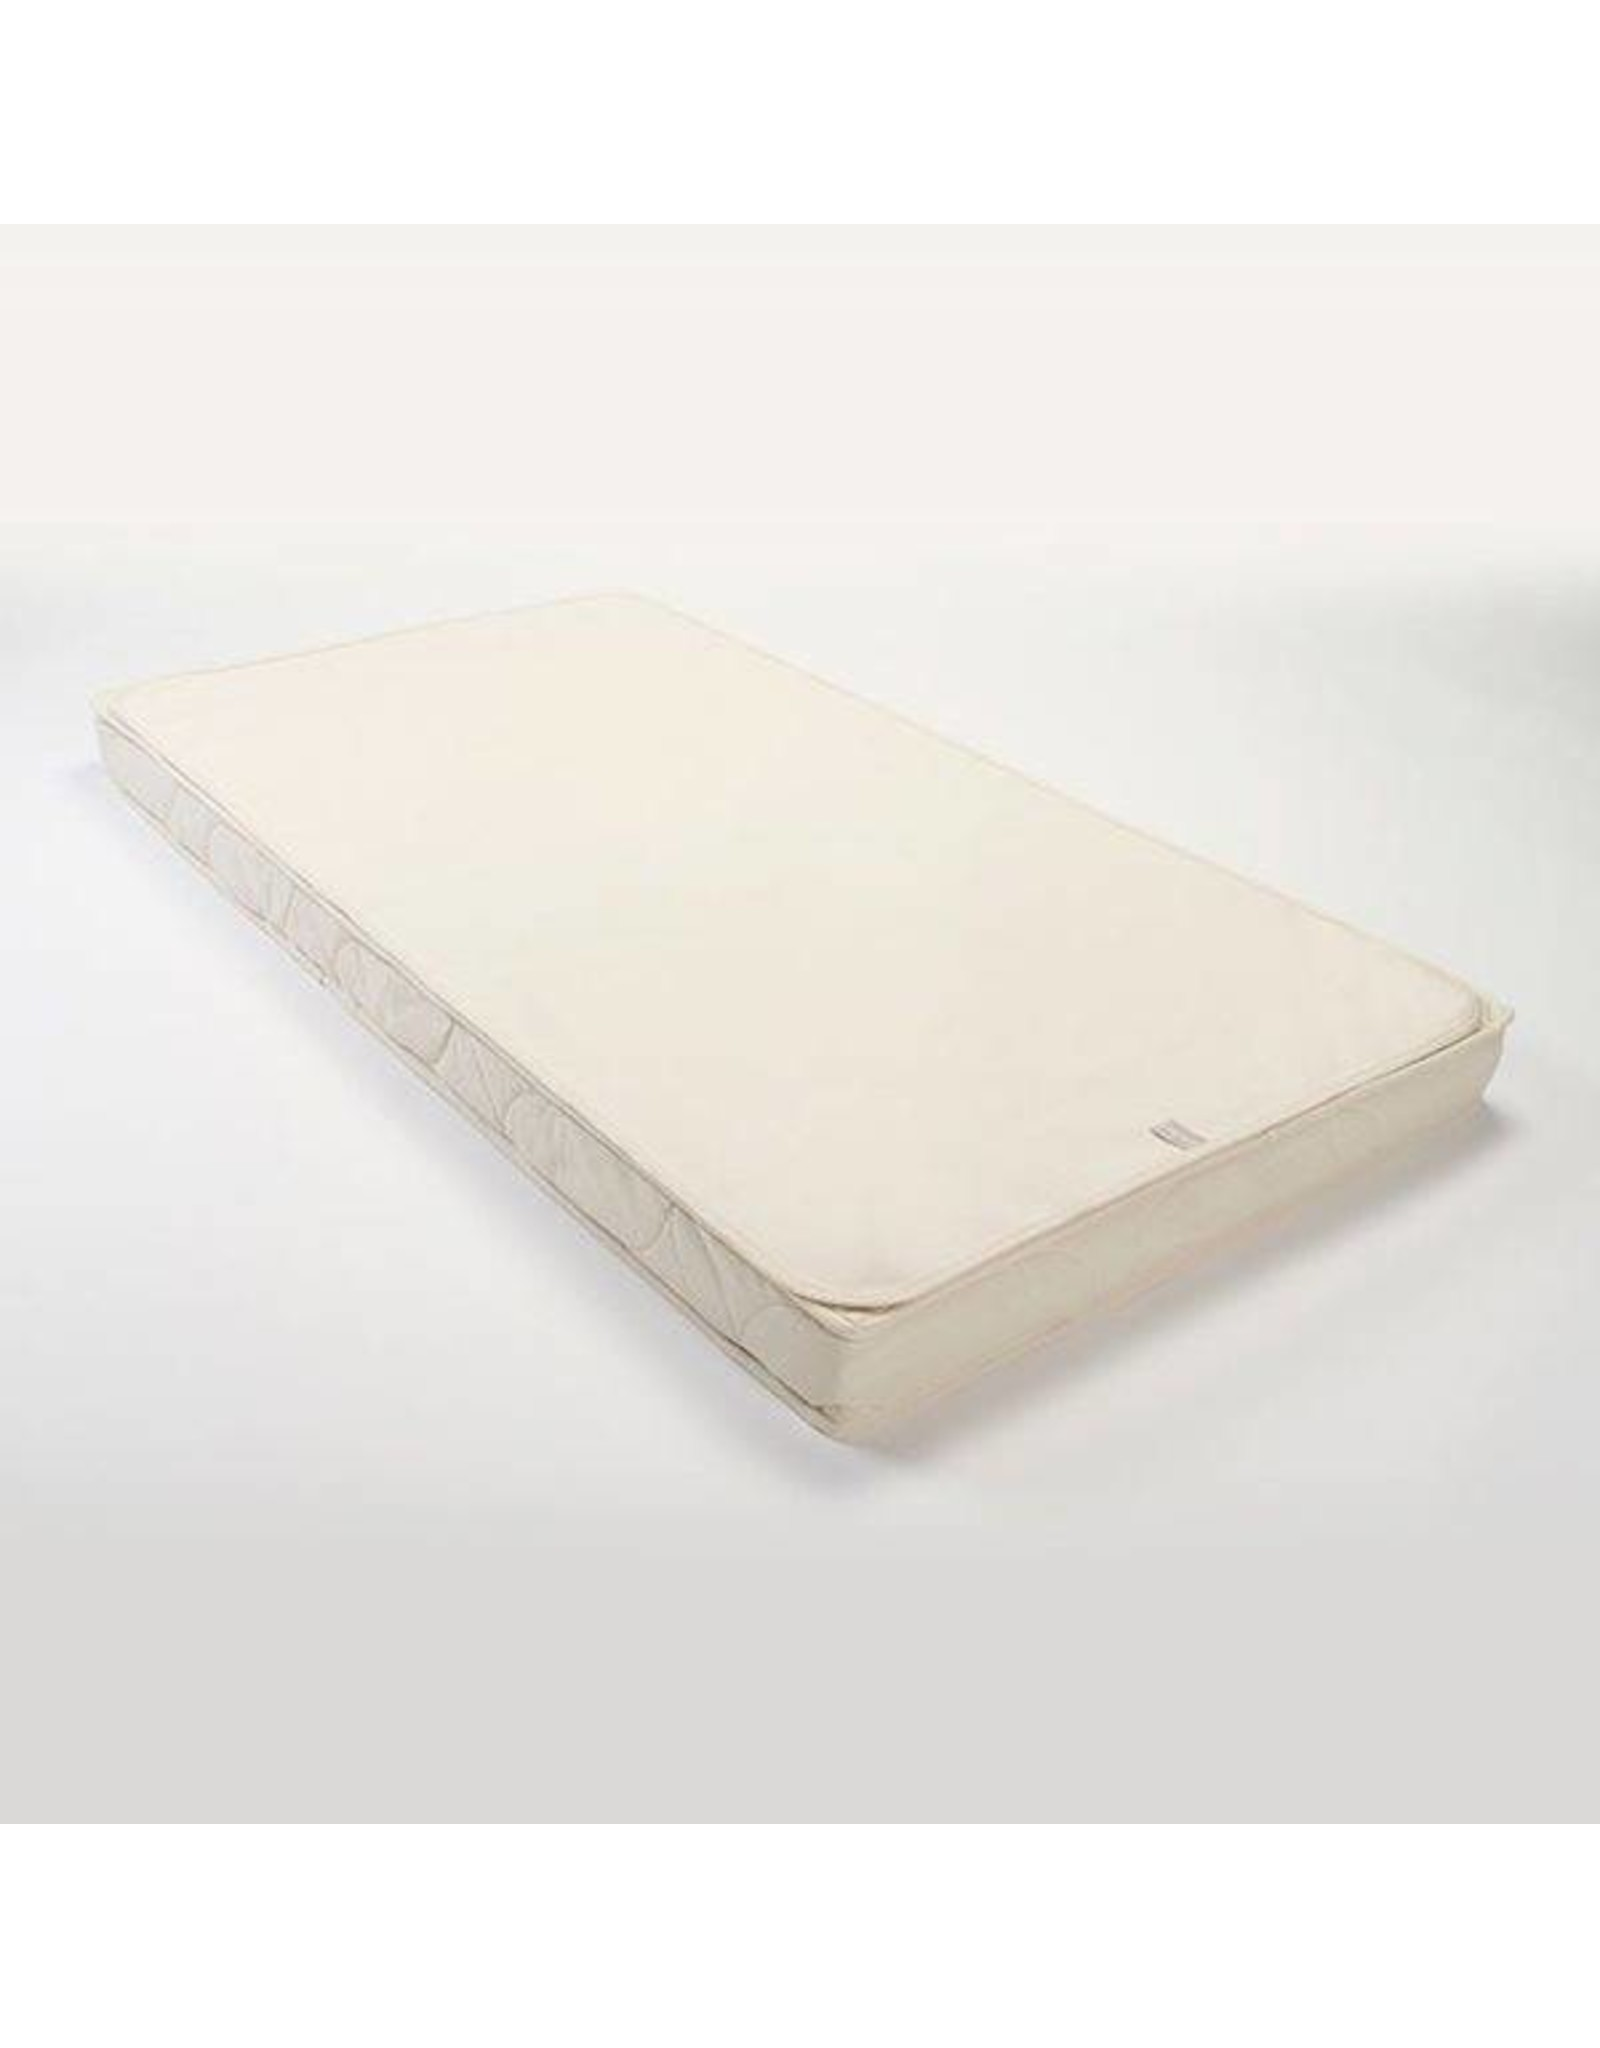 Little Green Sheep Organic Cotbed Mattress Protector- 70x140cm